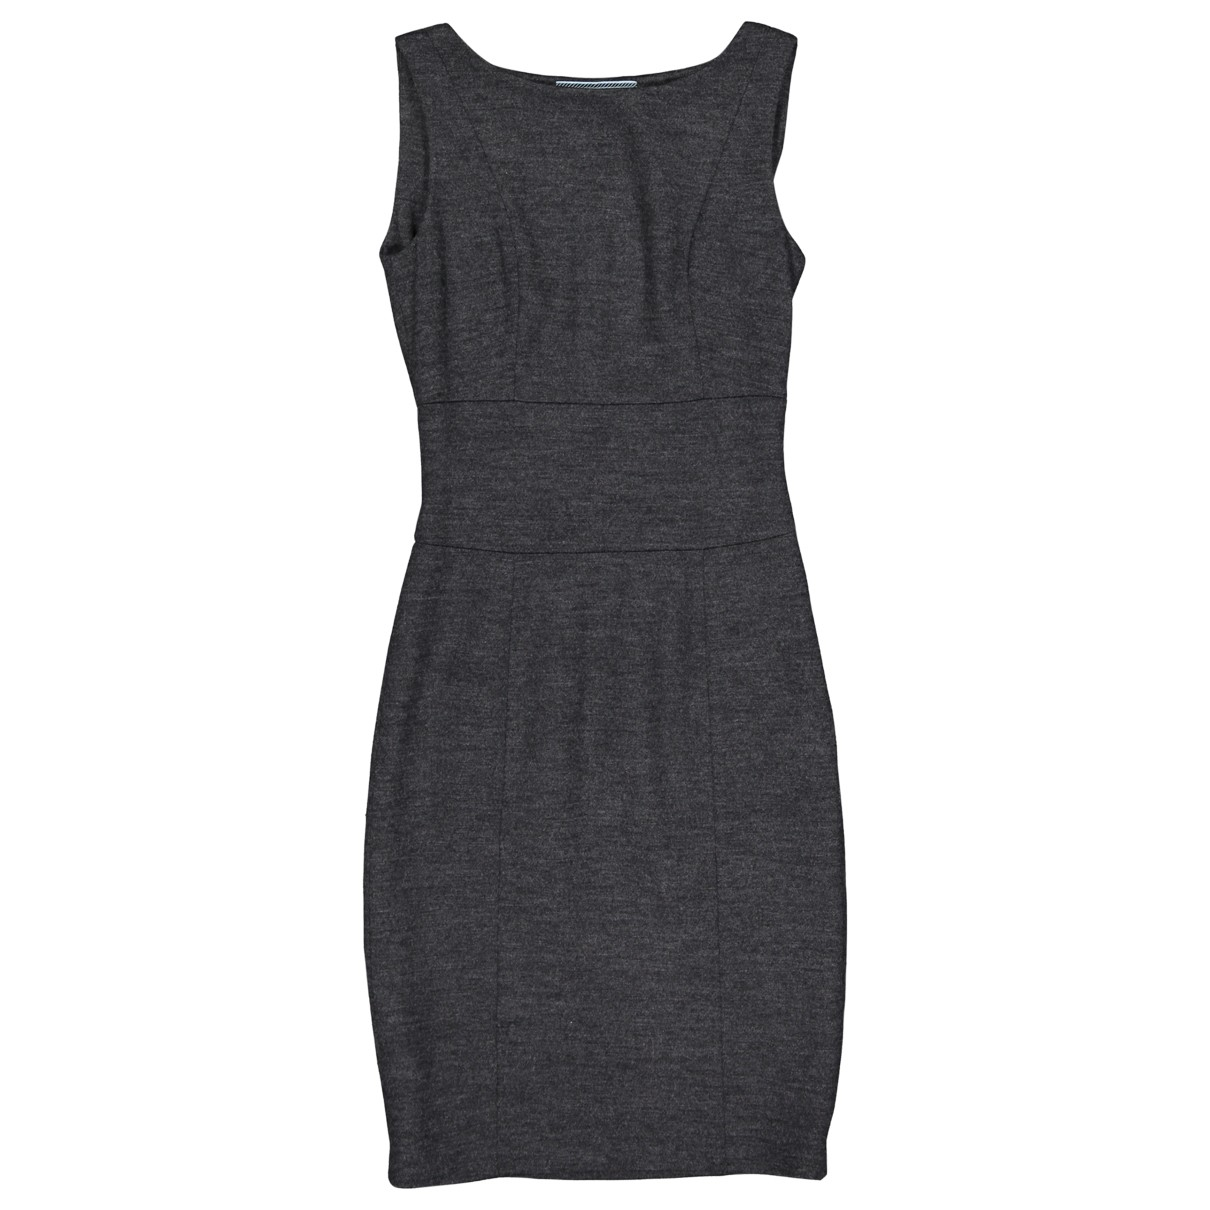 Prada \N Grey Wool dress for Women 36 IT